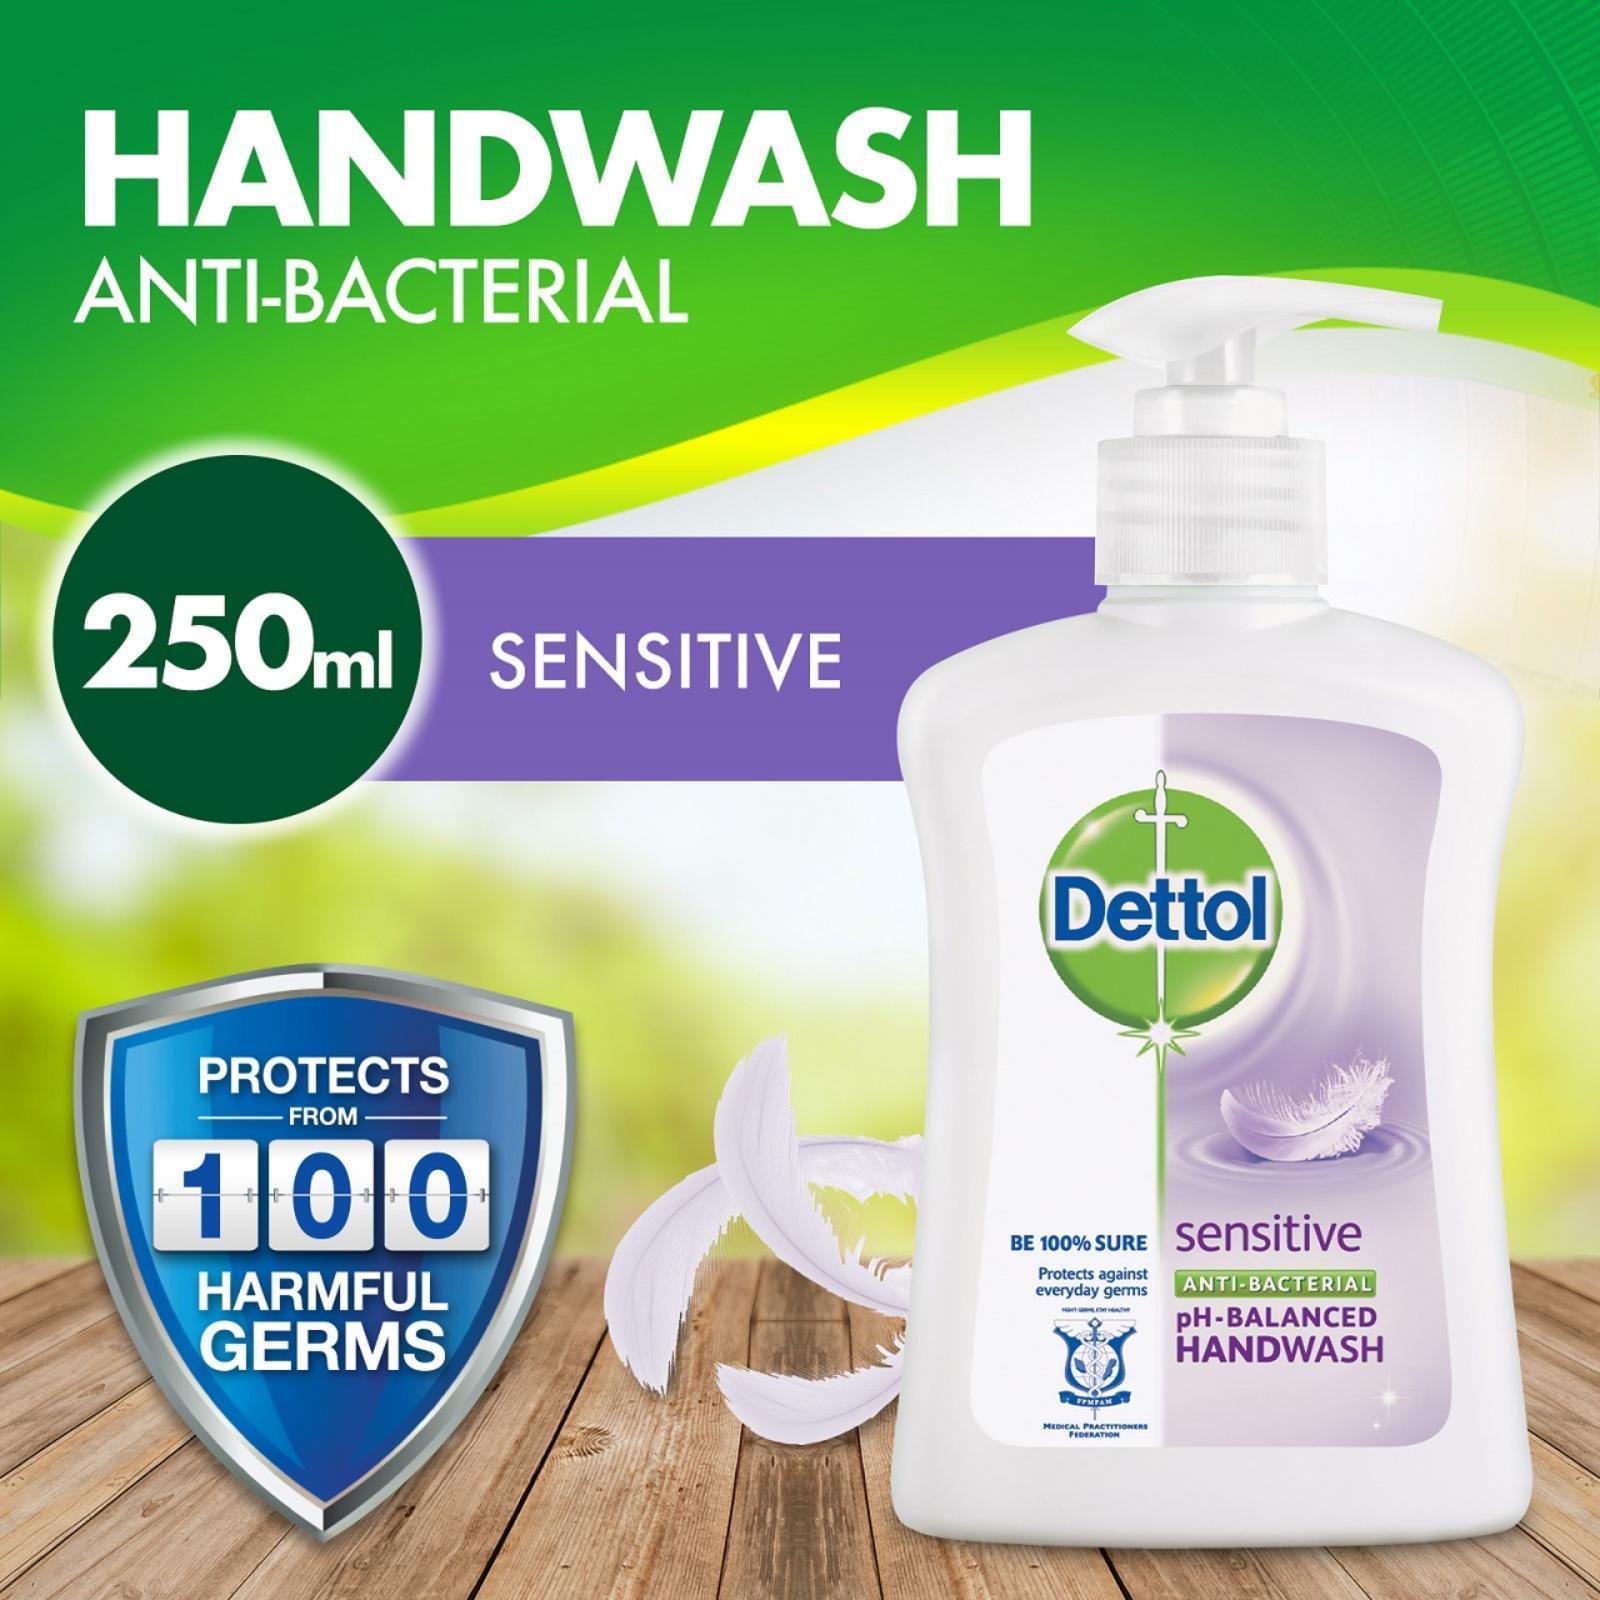 Dettol Anti-Bacterial Hand Soap Sensitive